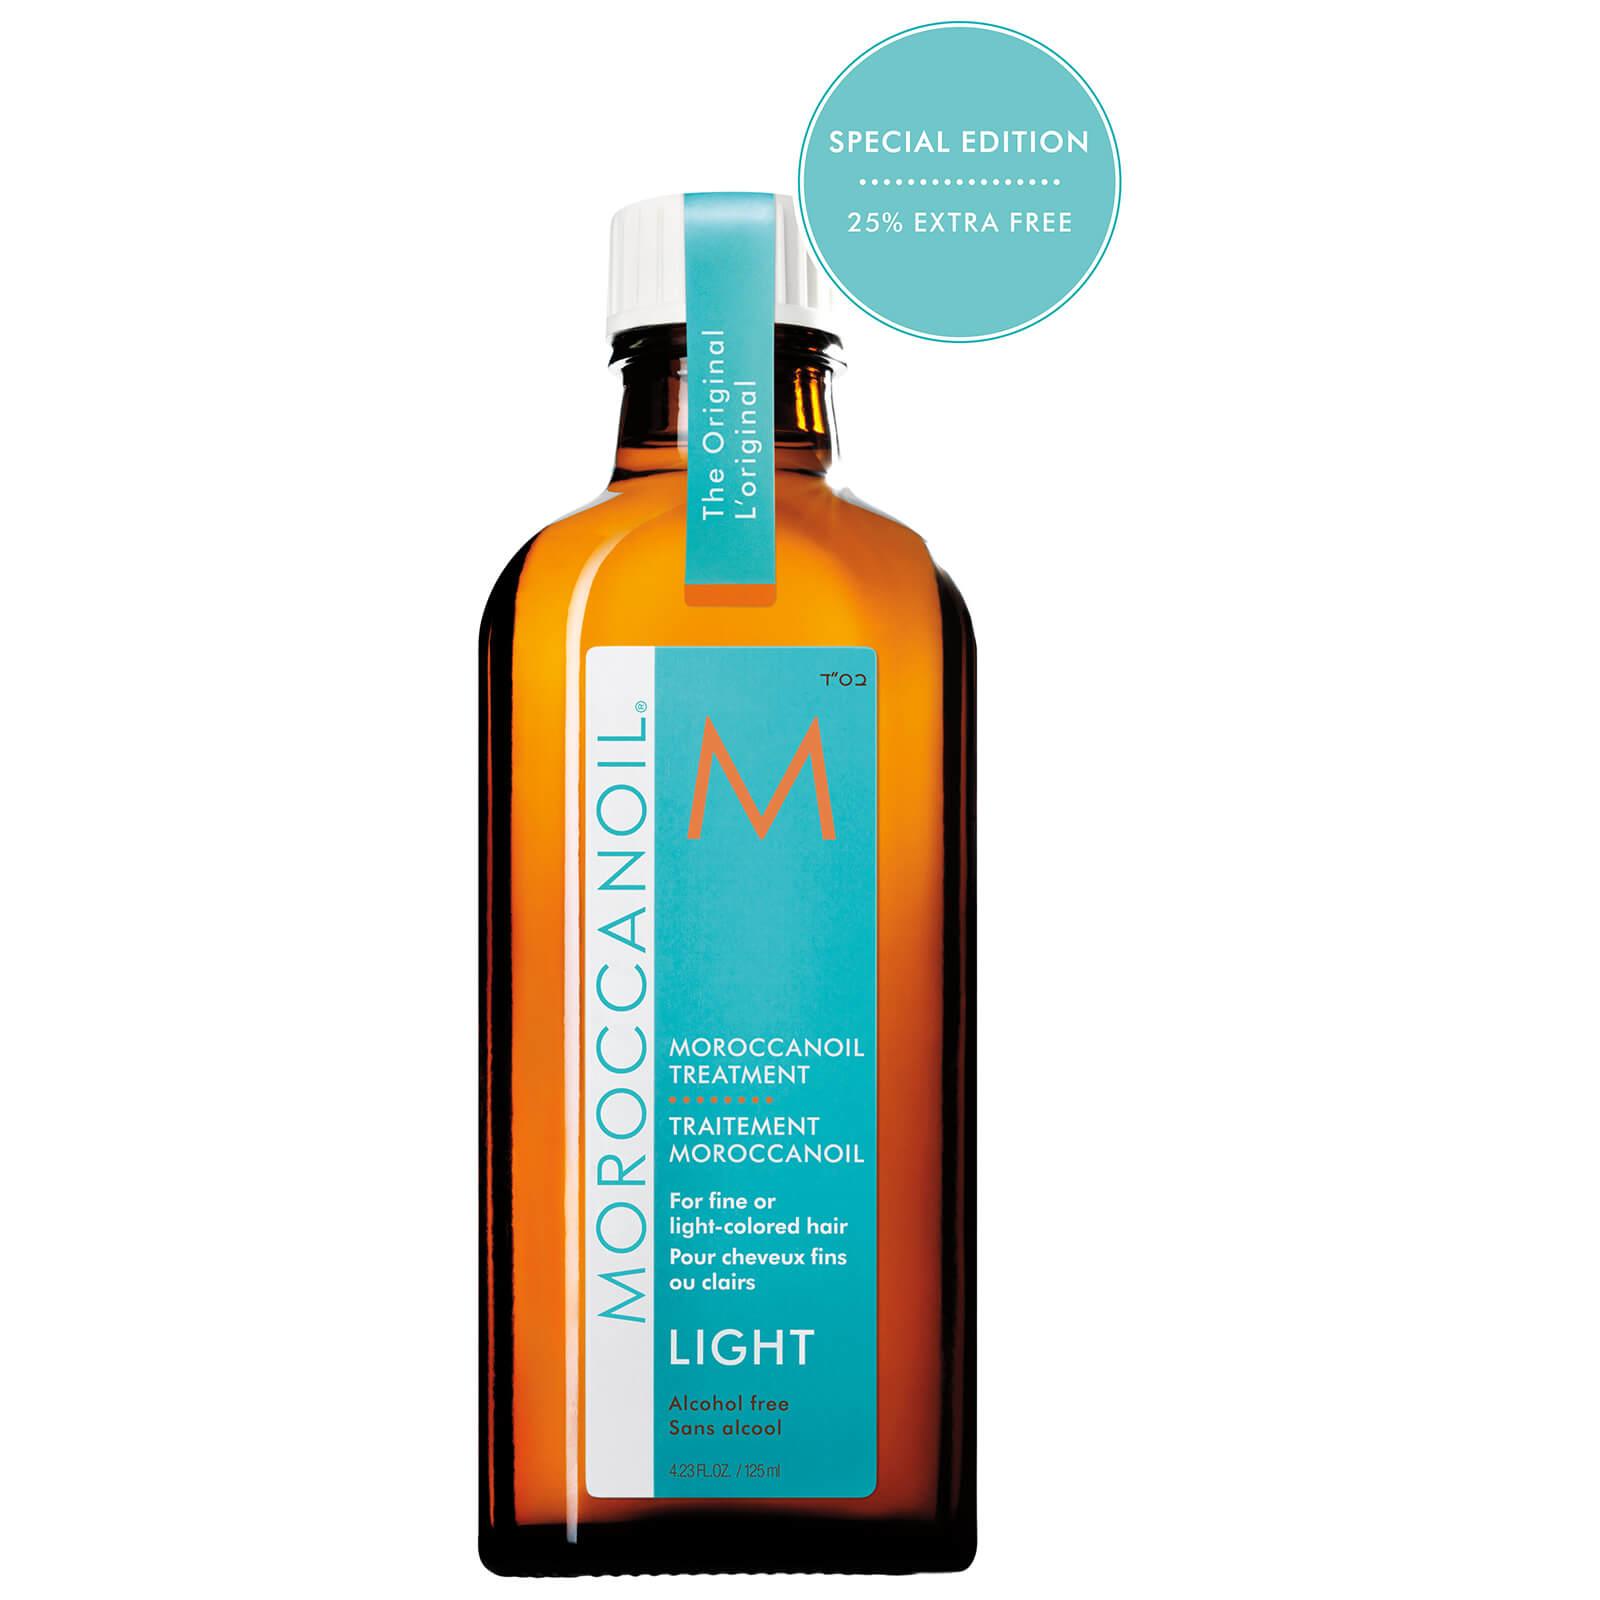 Moroccanoil Treatment Light (125ml) (25% Extra Free) (Worth £41.05)